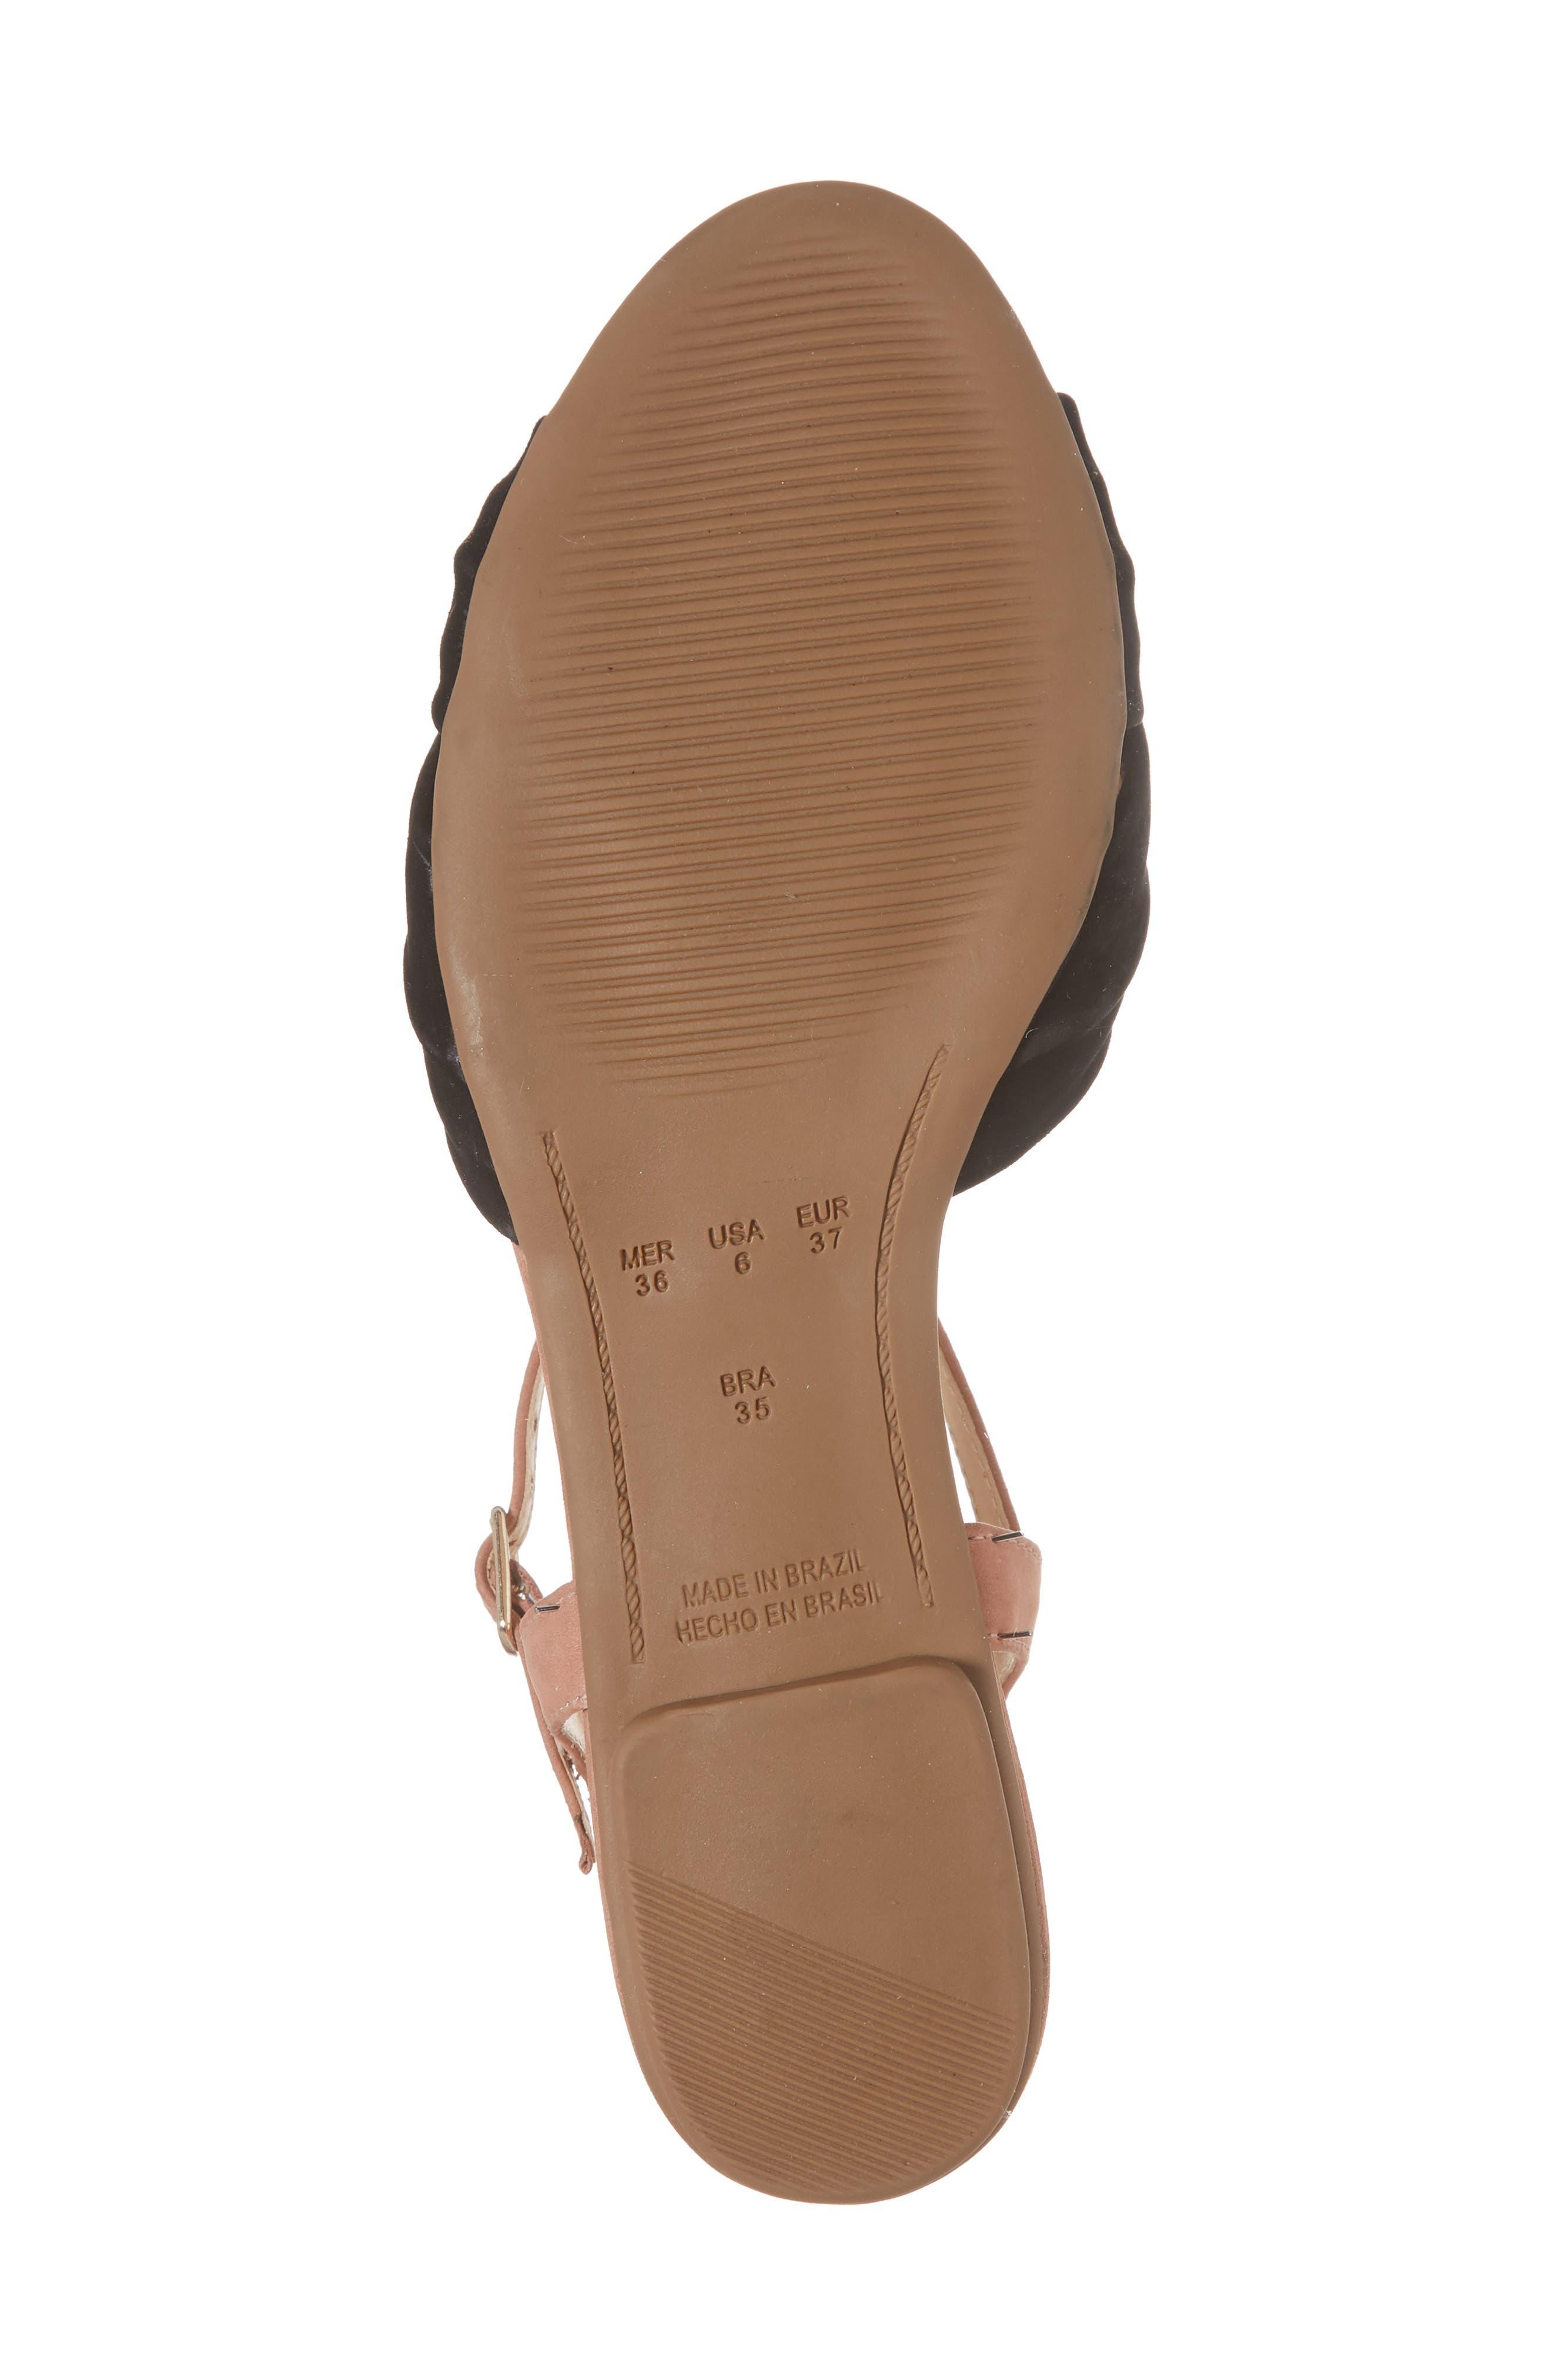 Giley Sandal,                             Alternate thumbnail 6, color,                             Black Nubuck Leather